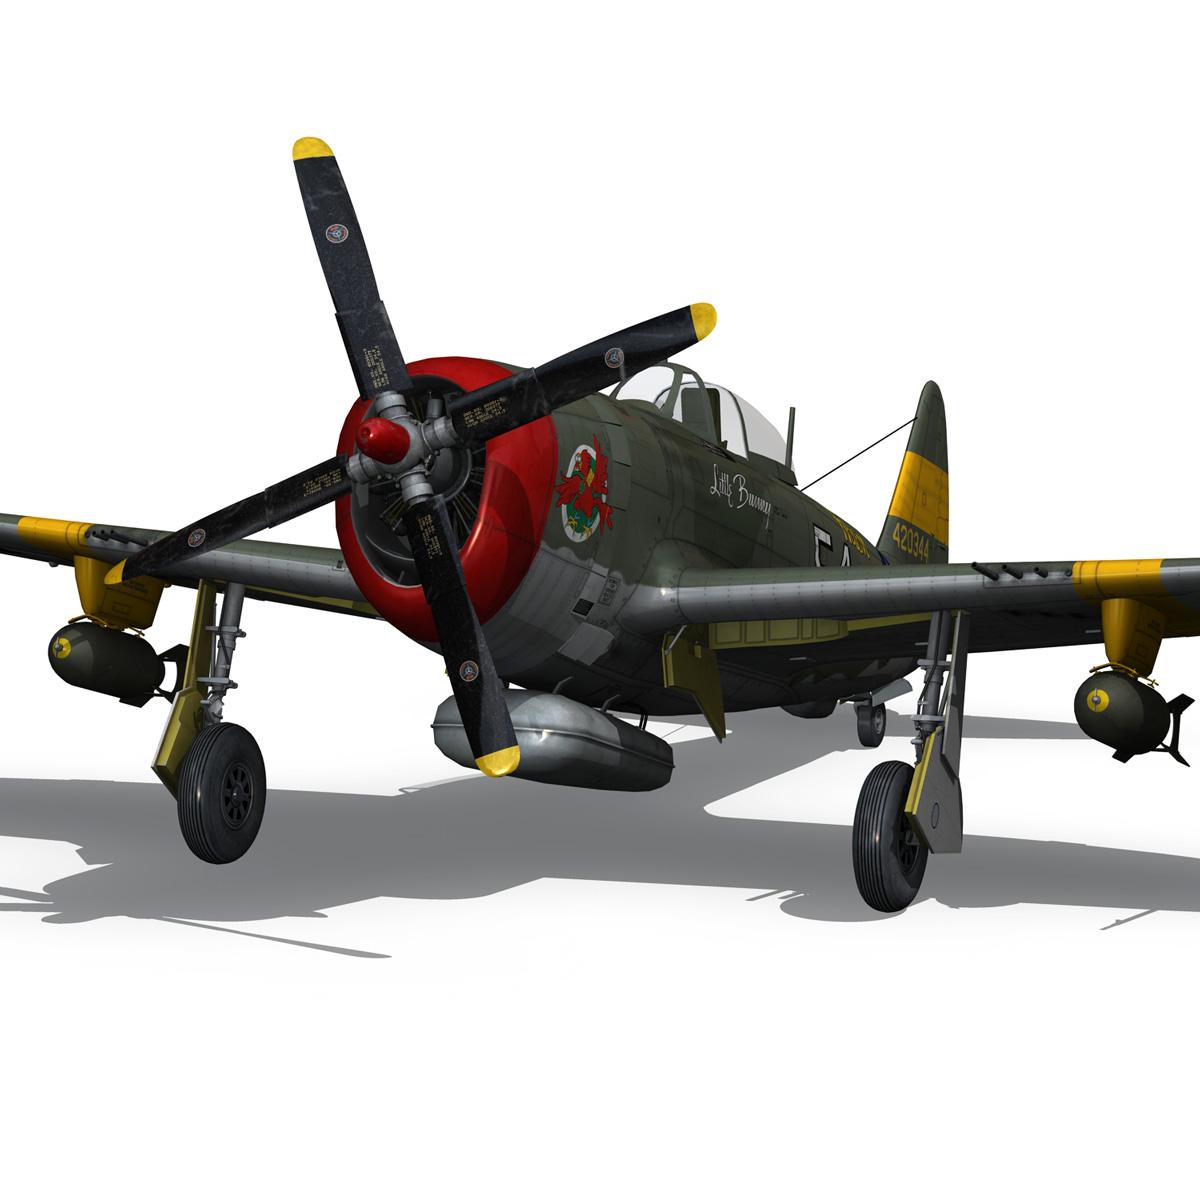 republic p-47d thunderbolt – little bunny 3d model fbx c4d lwo obj 274234